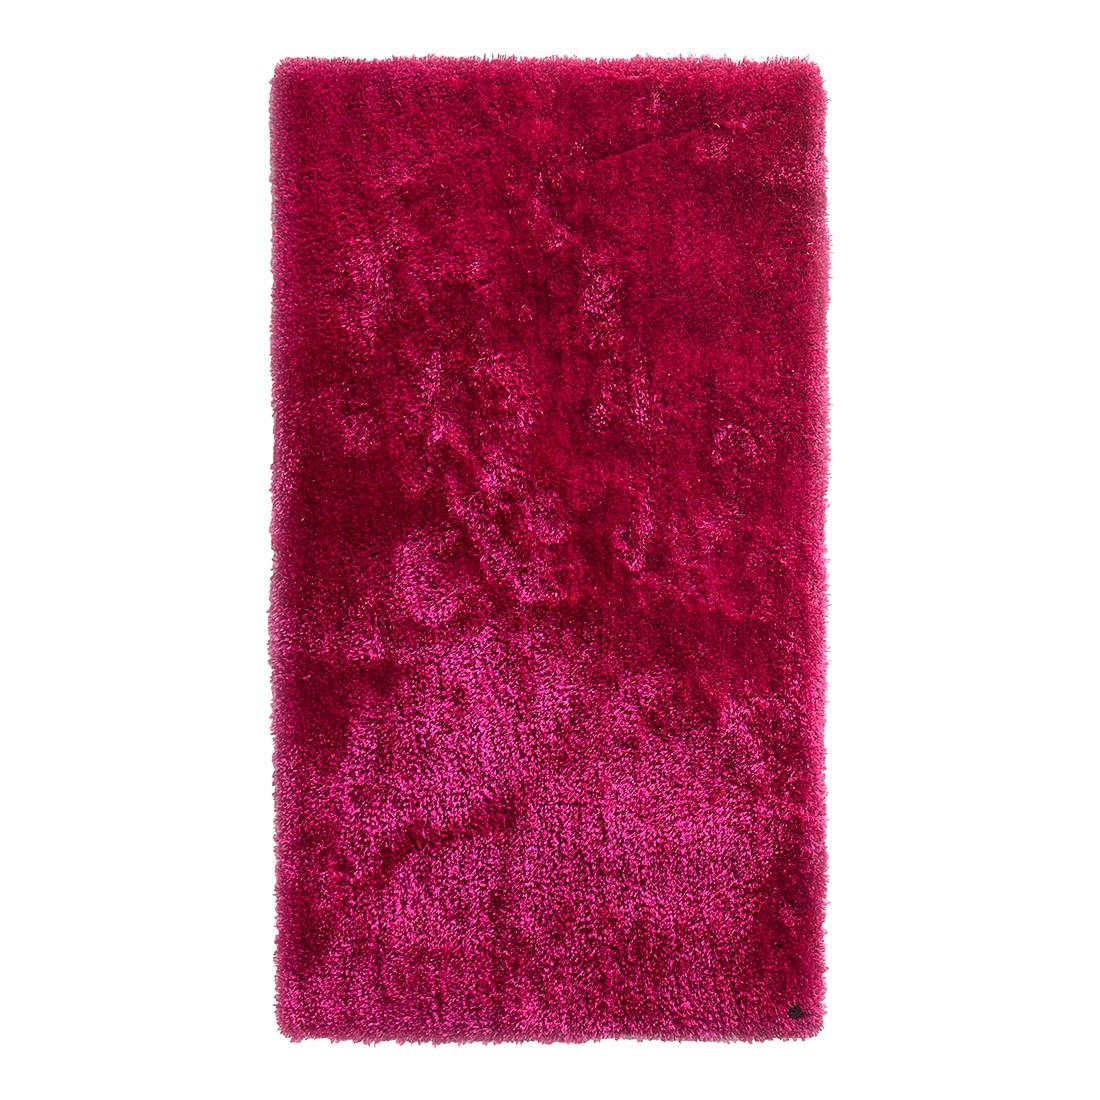 Roze tapijt kopen?  Online Internetwinkel